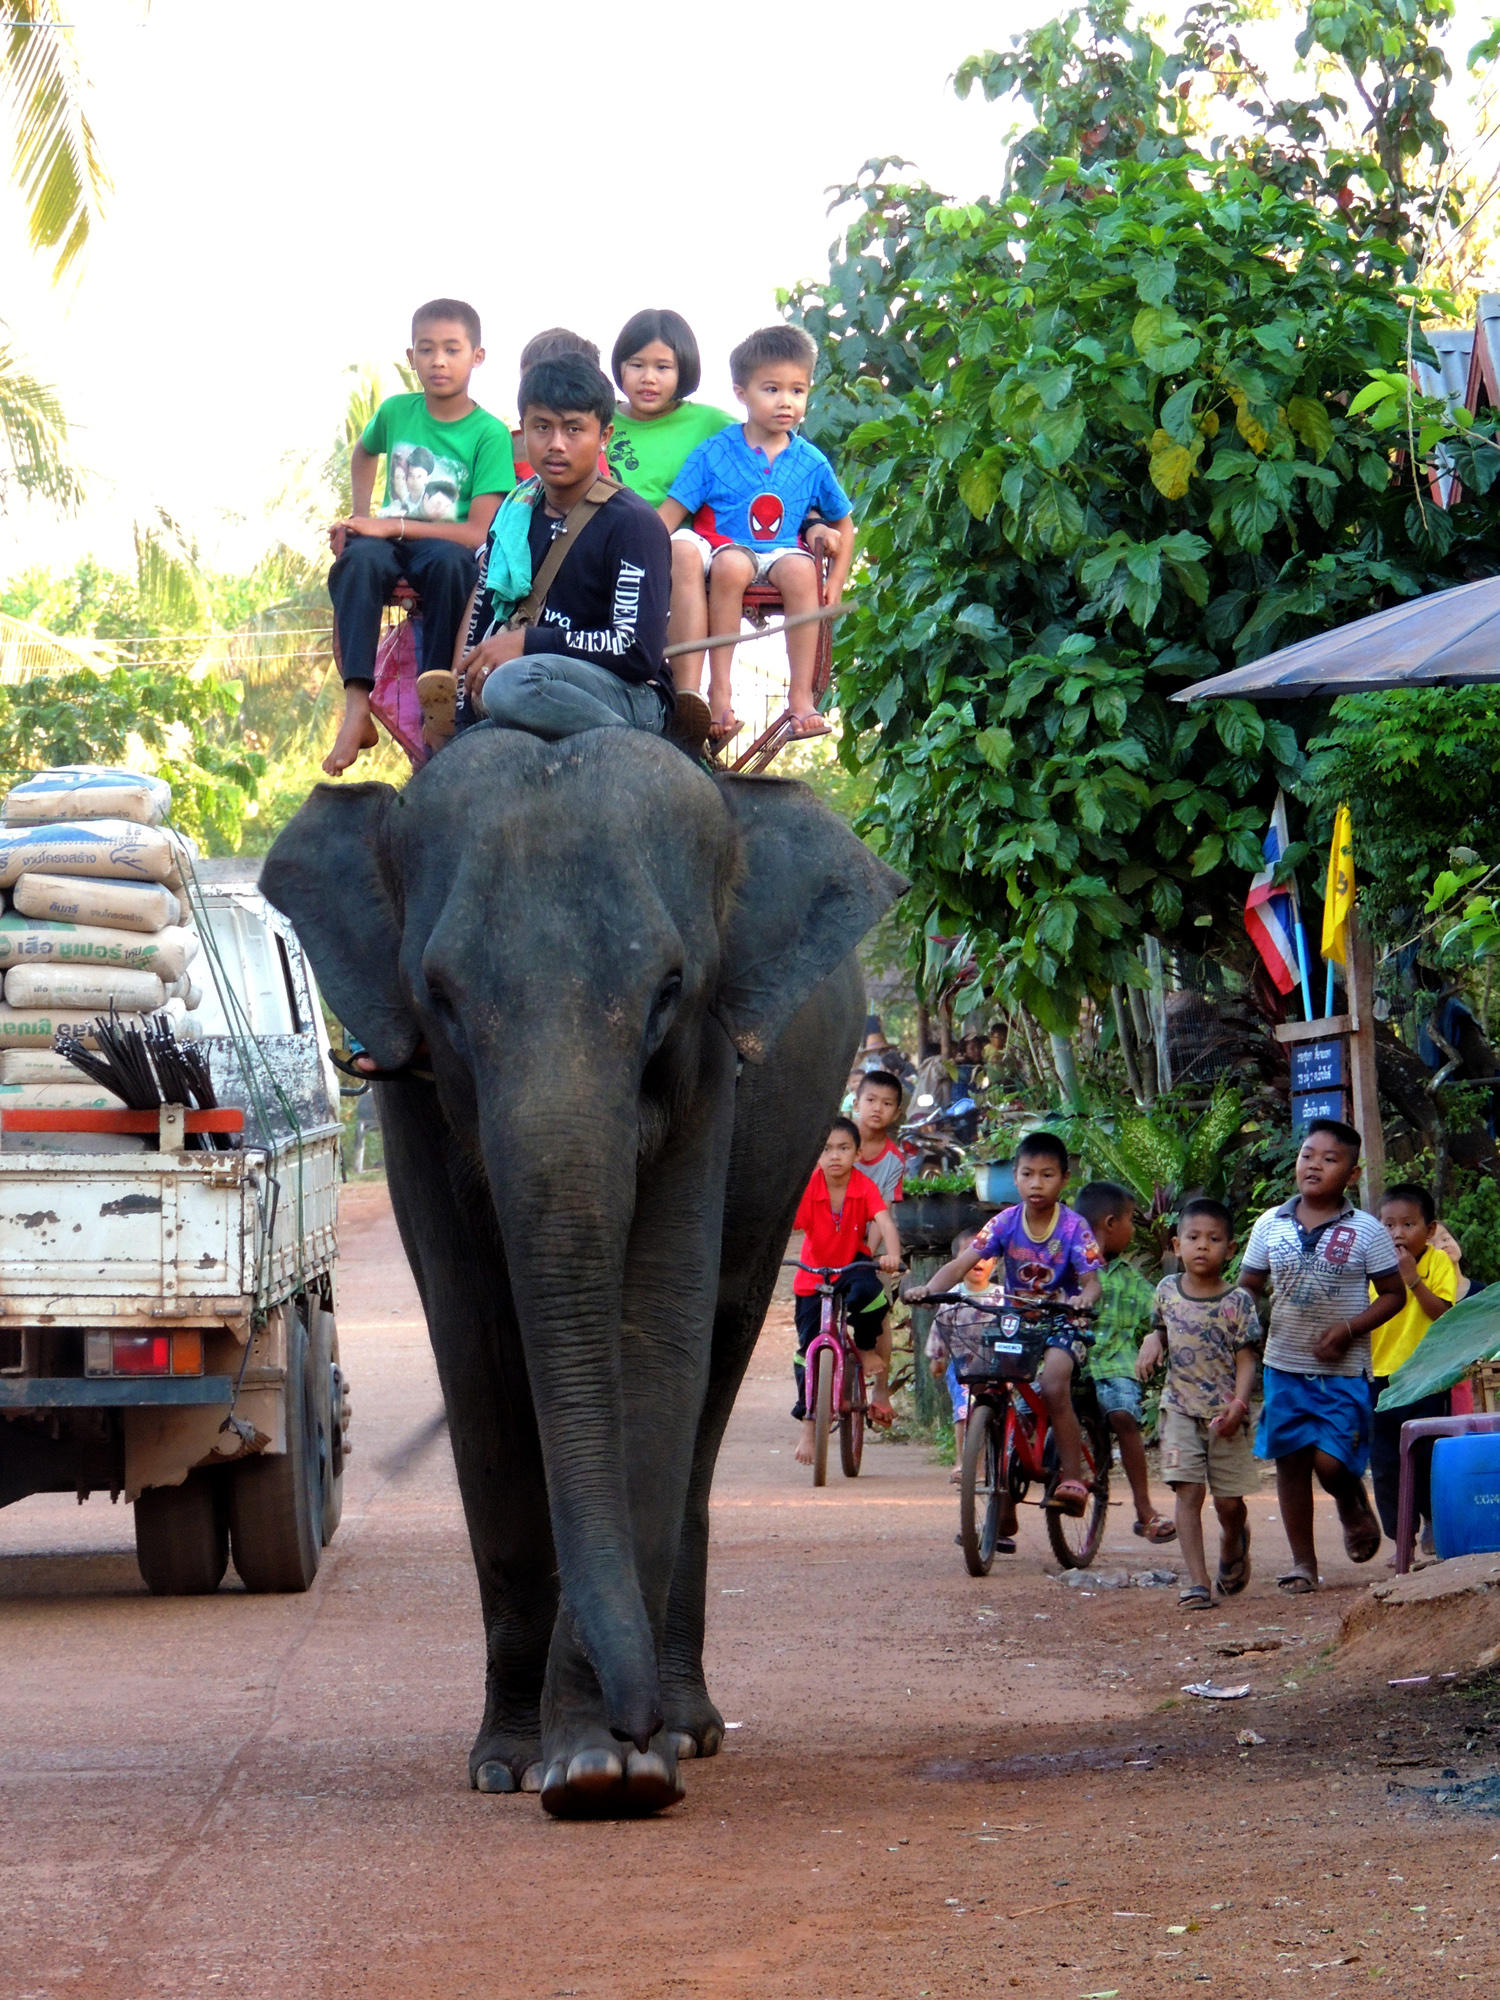 P0013 Elephants01.jpg